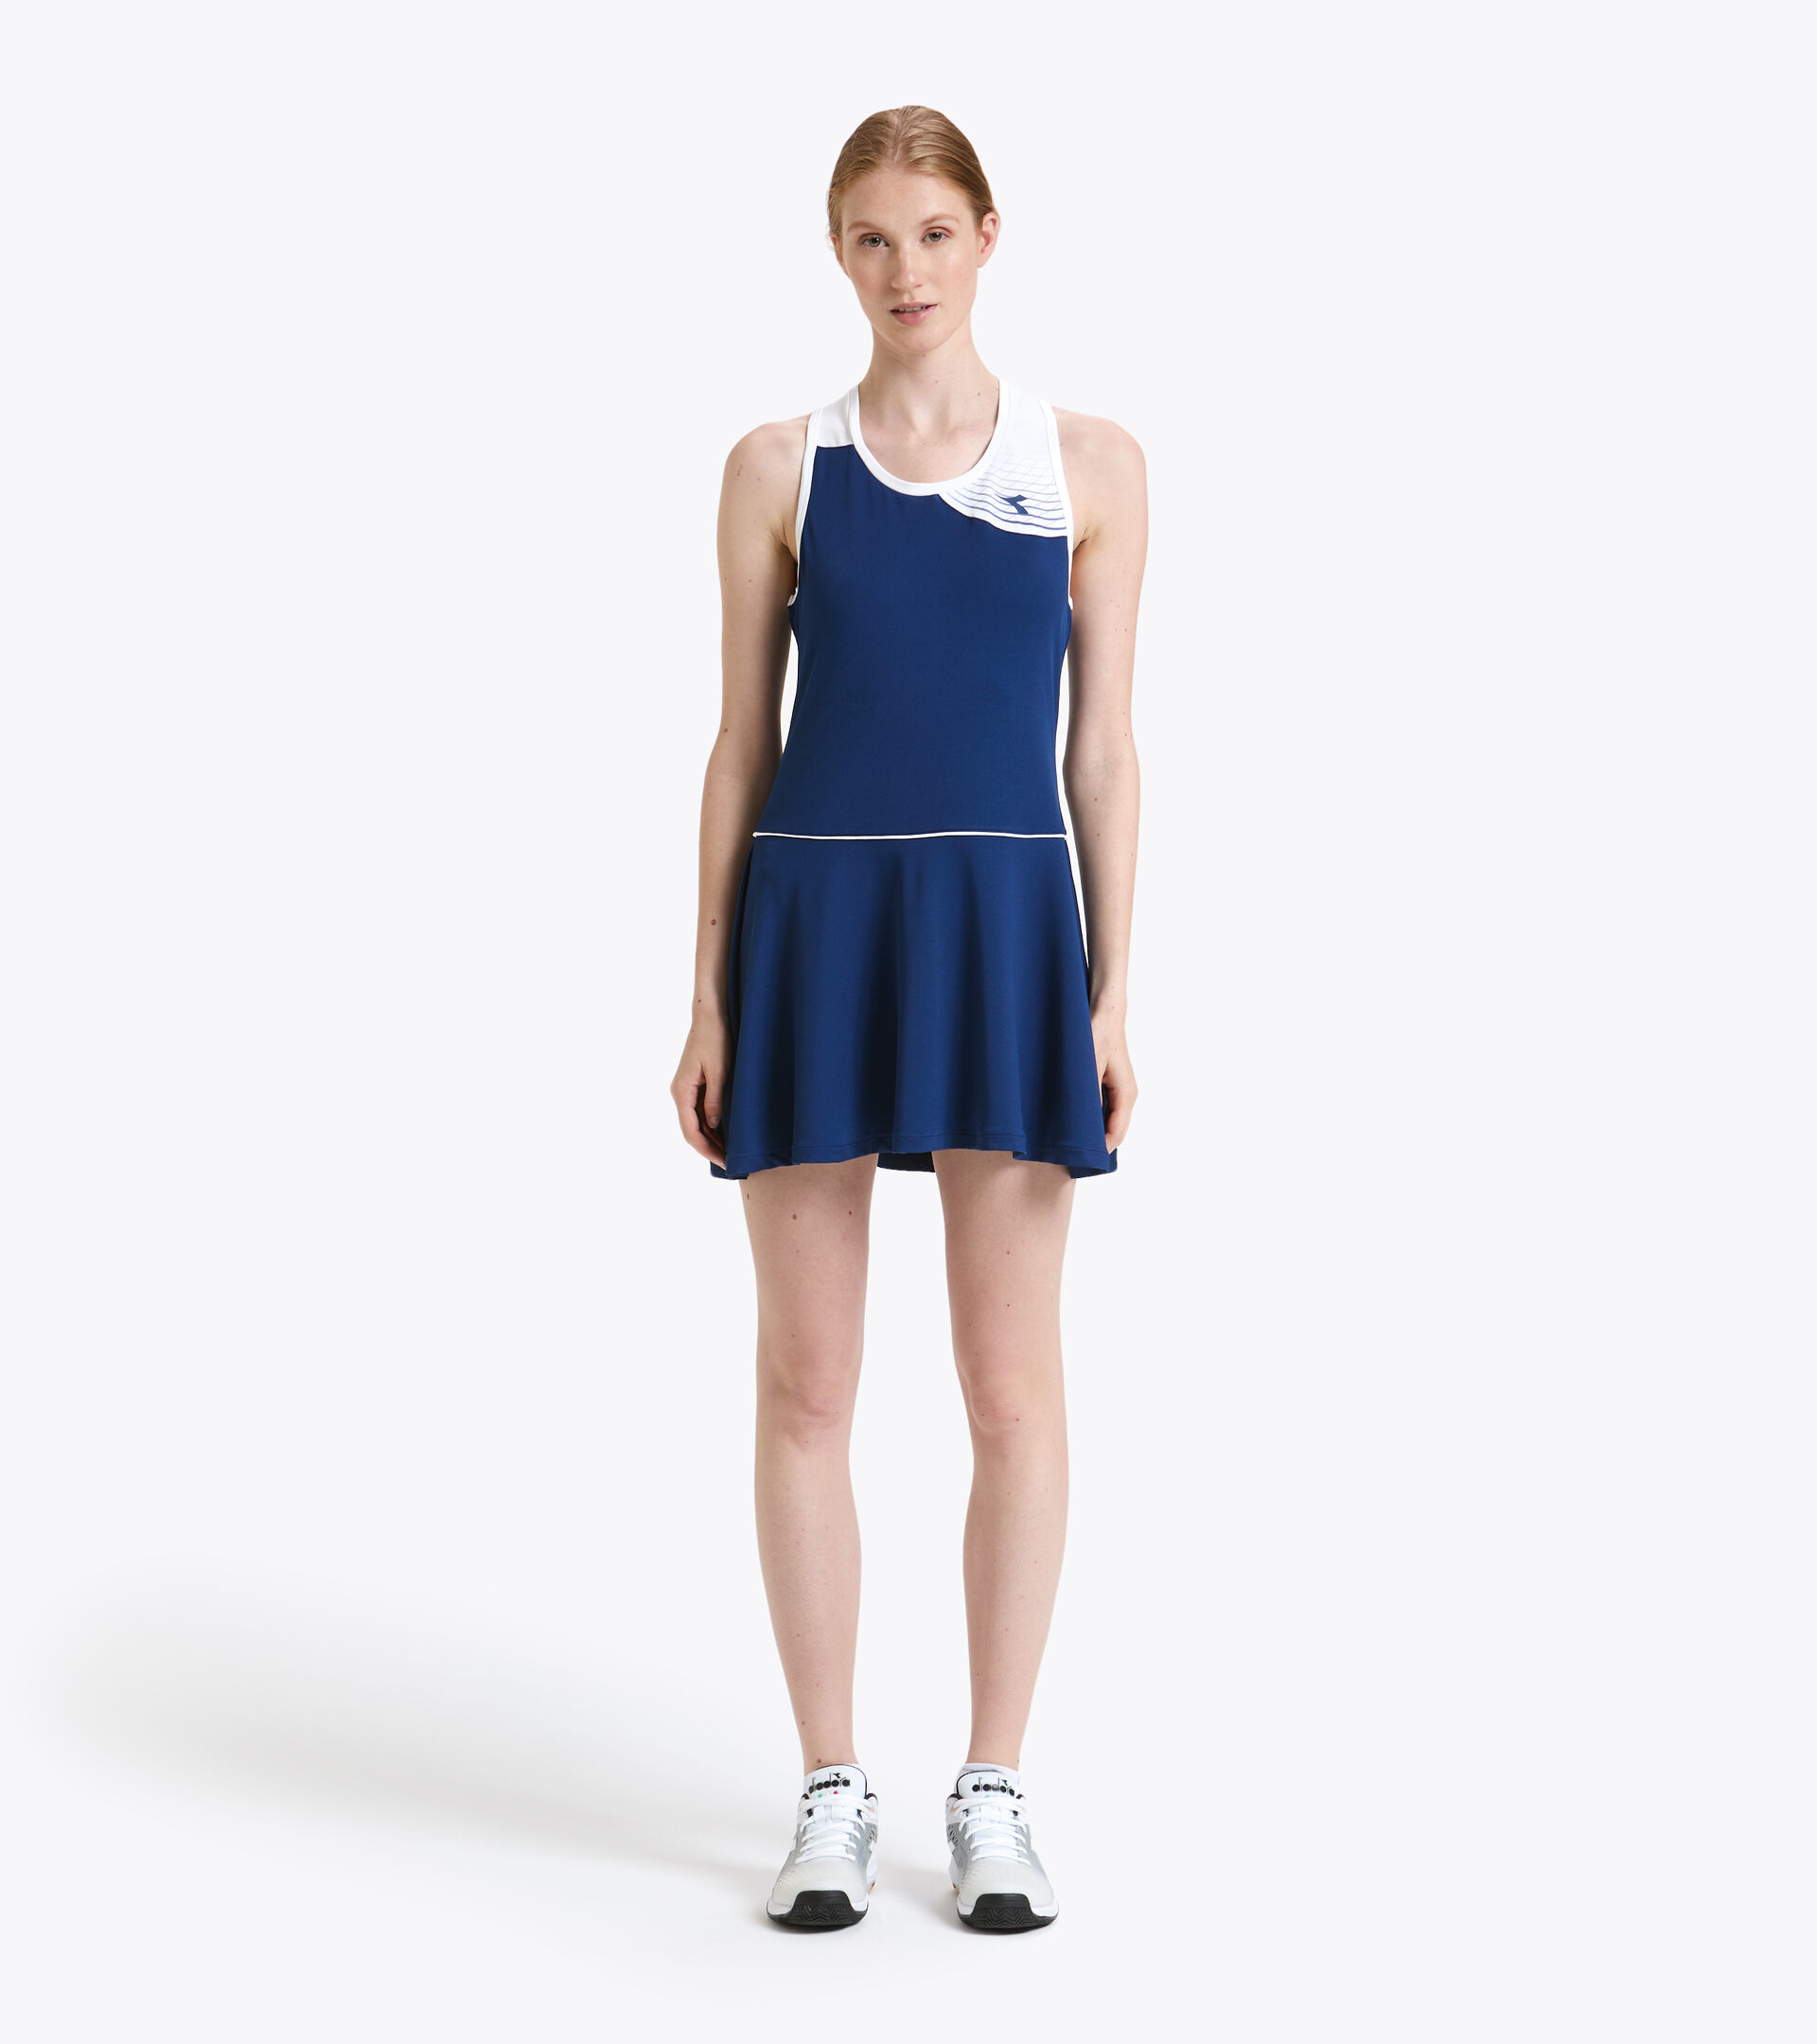 Abito da tennis - Donna L. DRESS COURT BLU ESTATE - Diadora